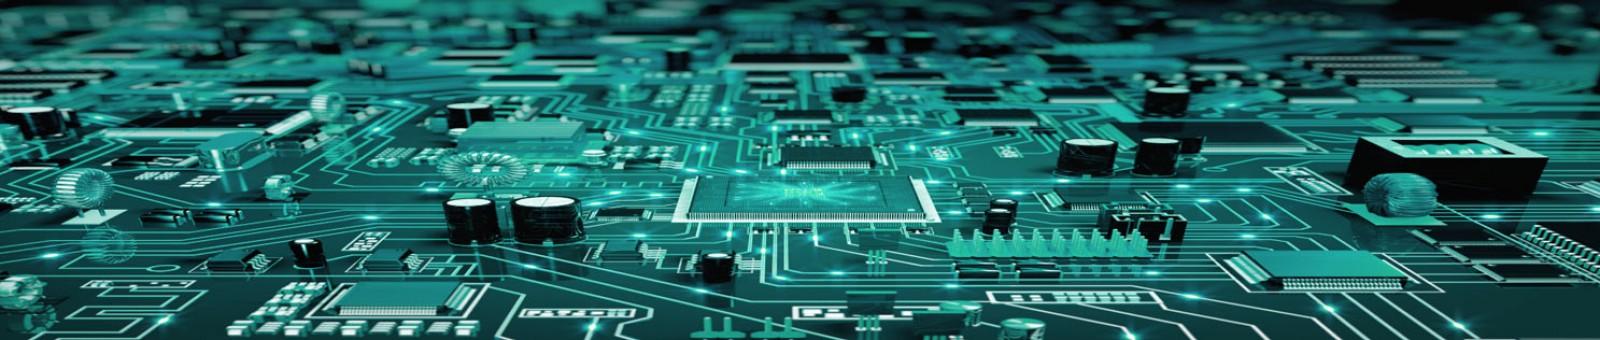 electronicsmanufacturer